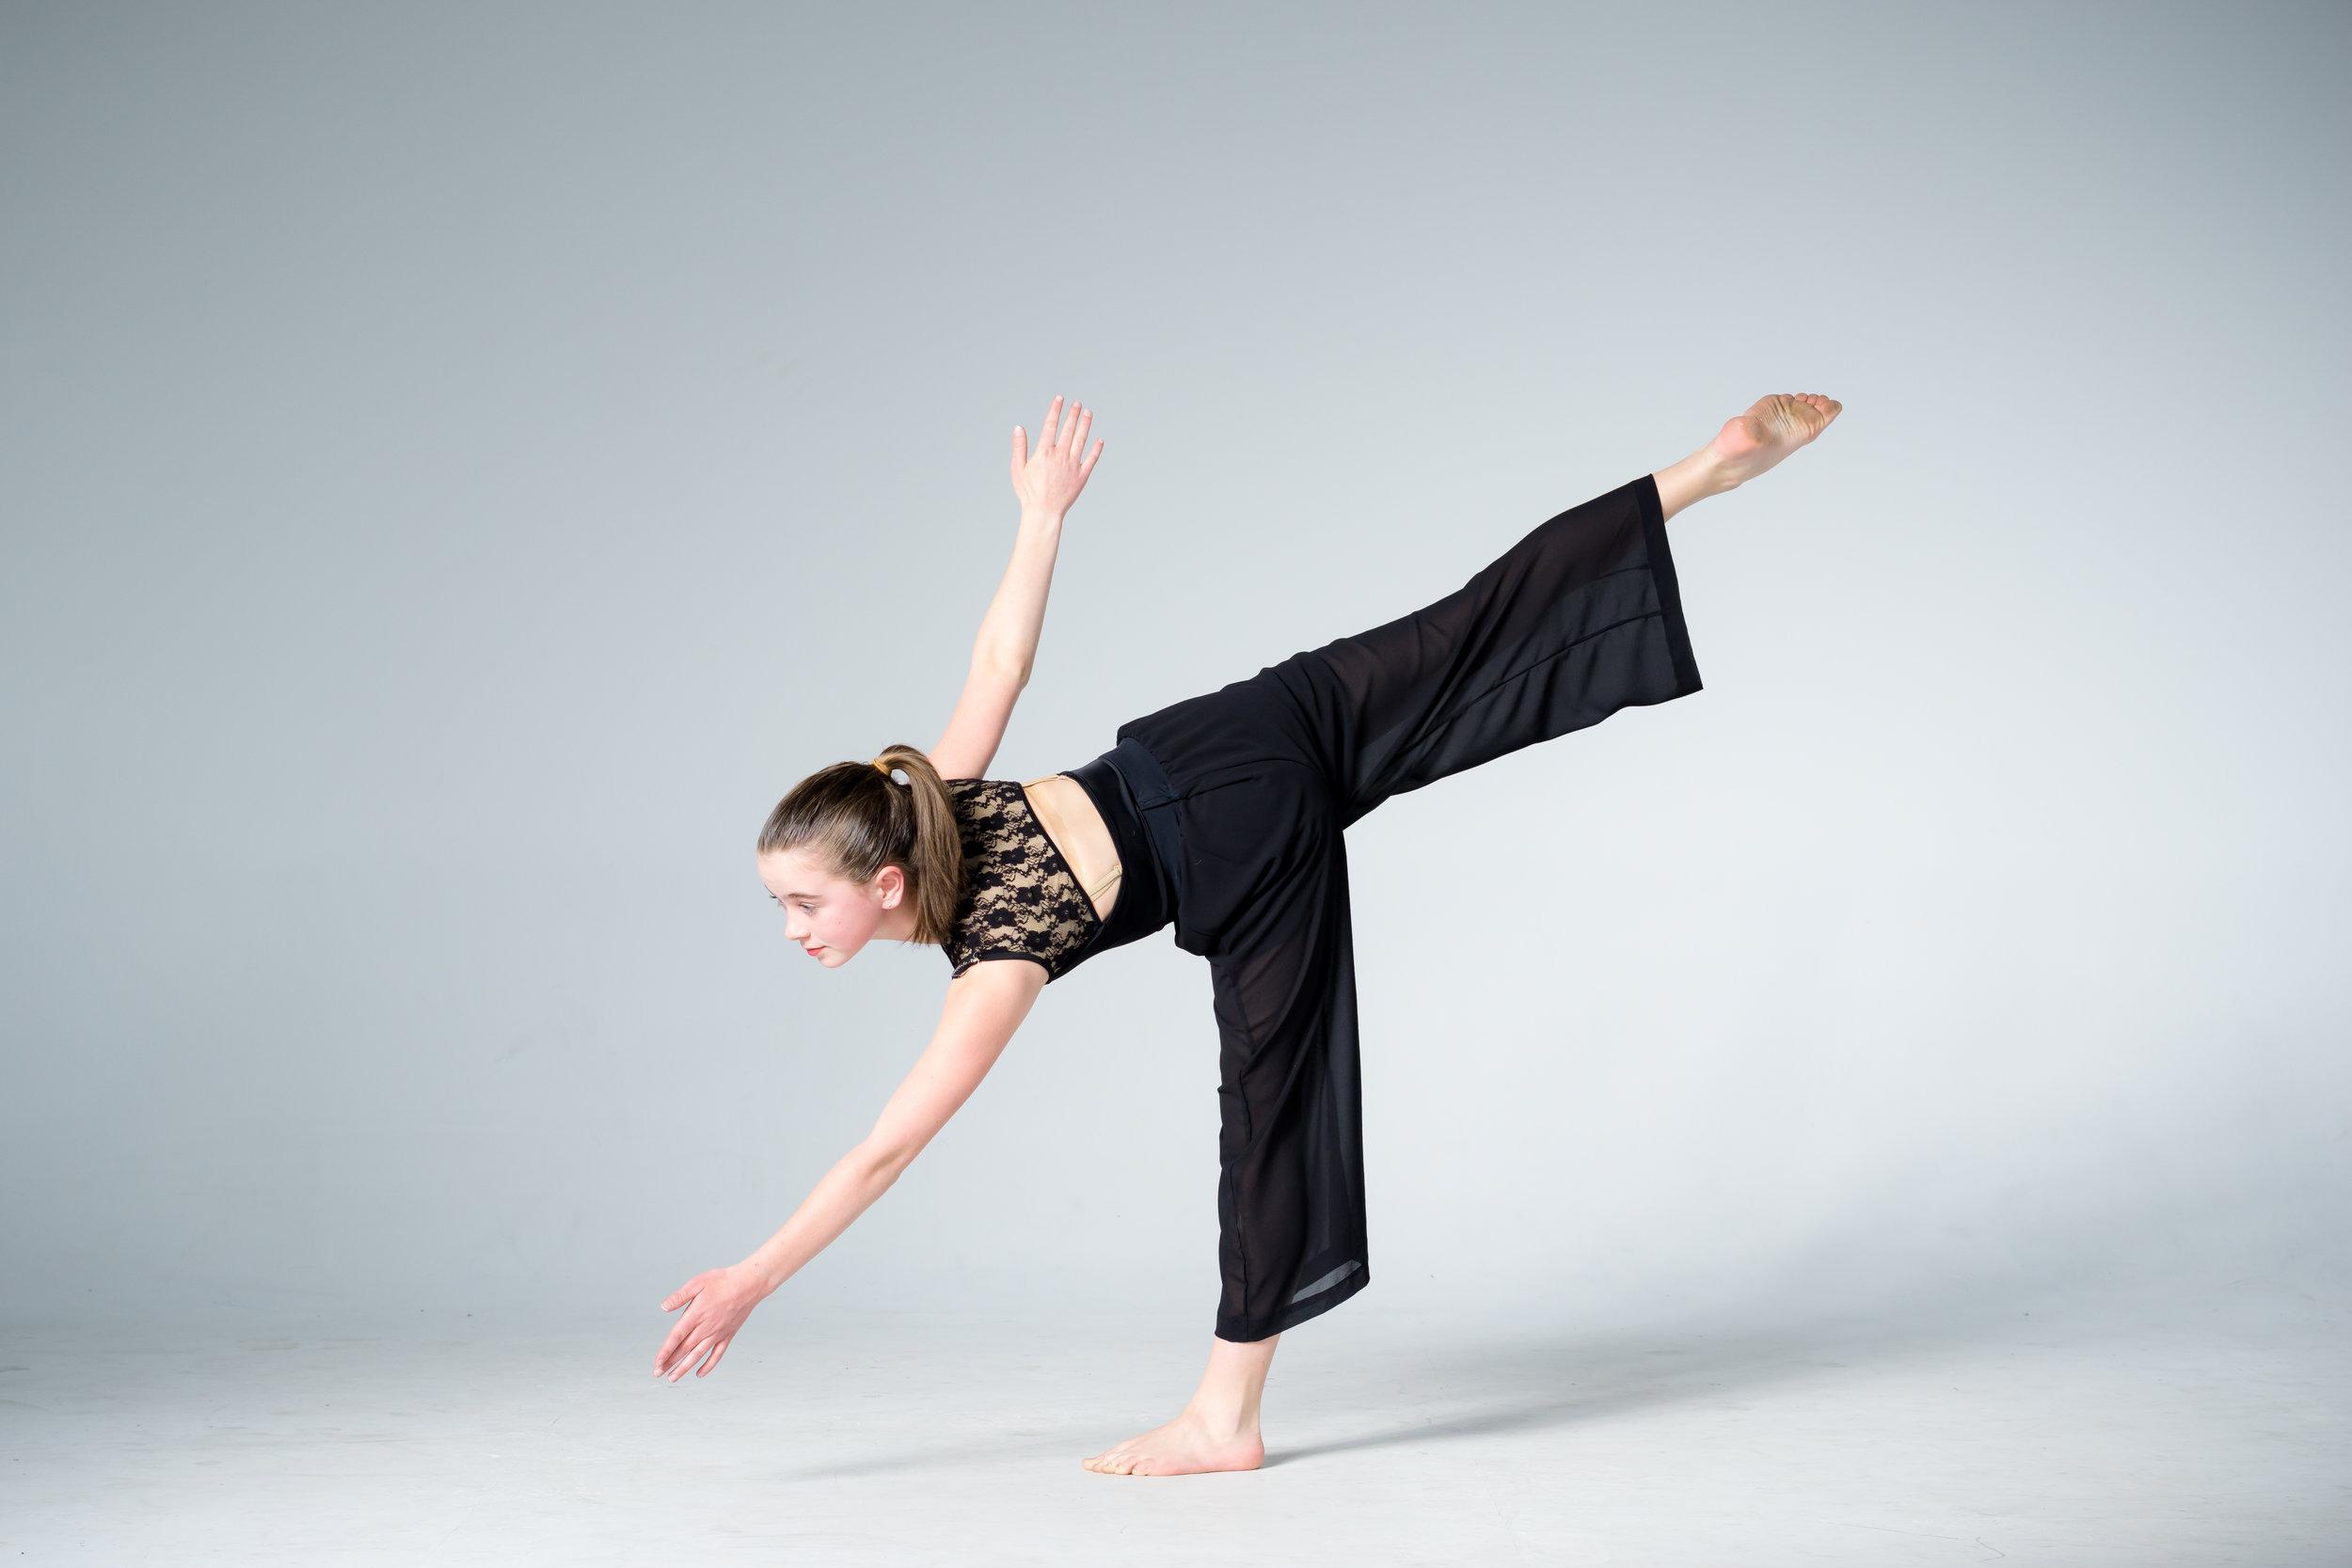 young modern dancer balancing on one leg